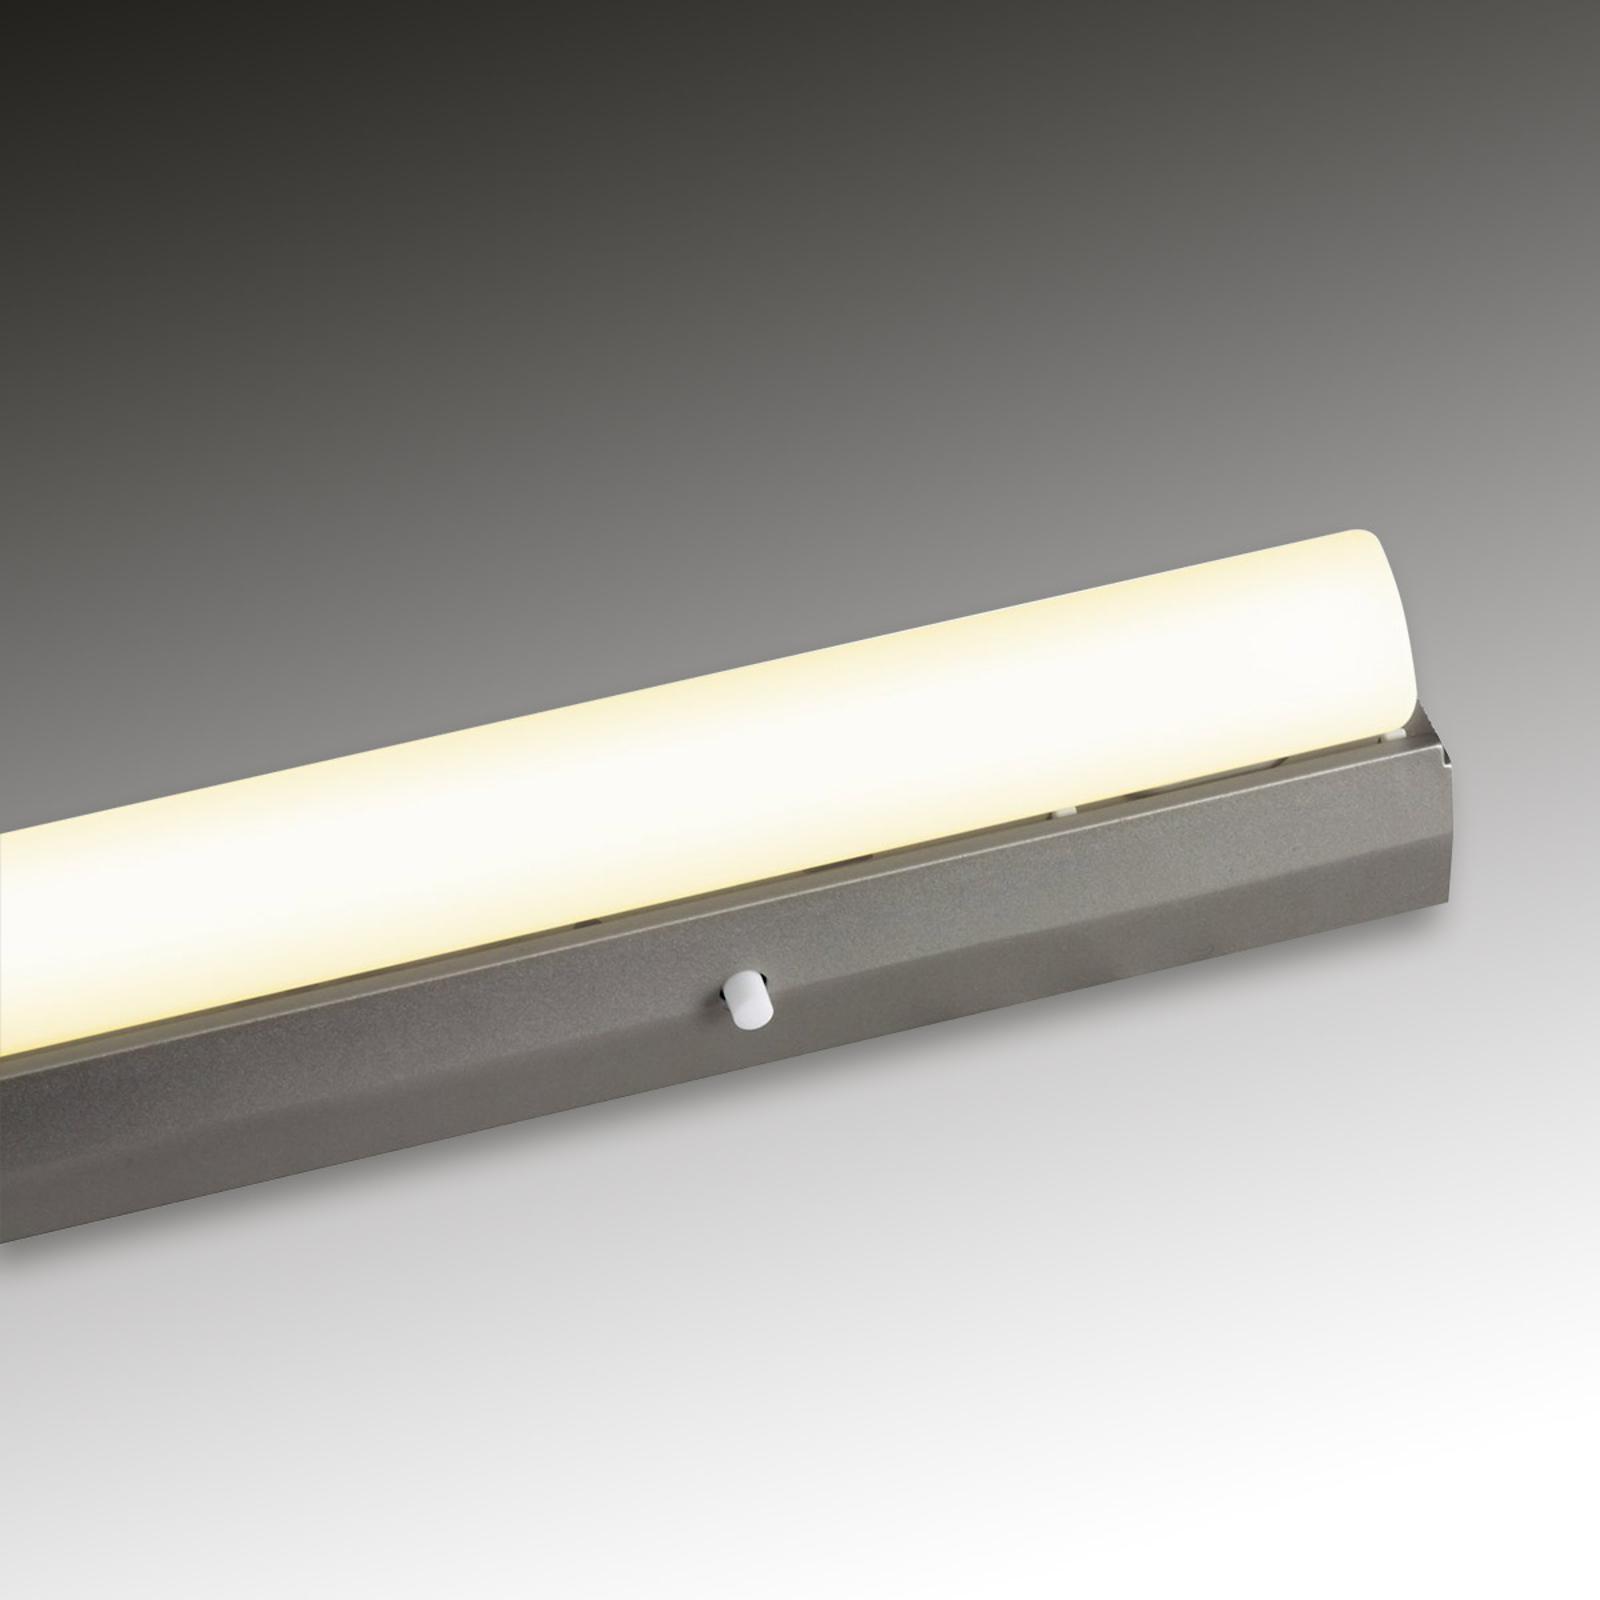 Rampe lumineuse blanche applique 60 W